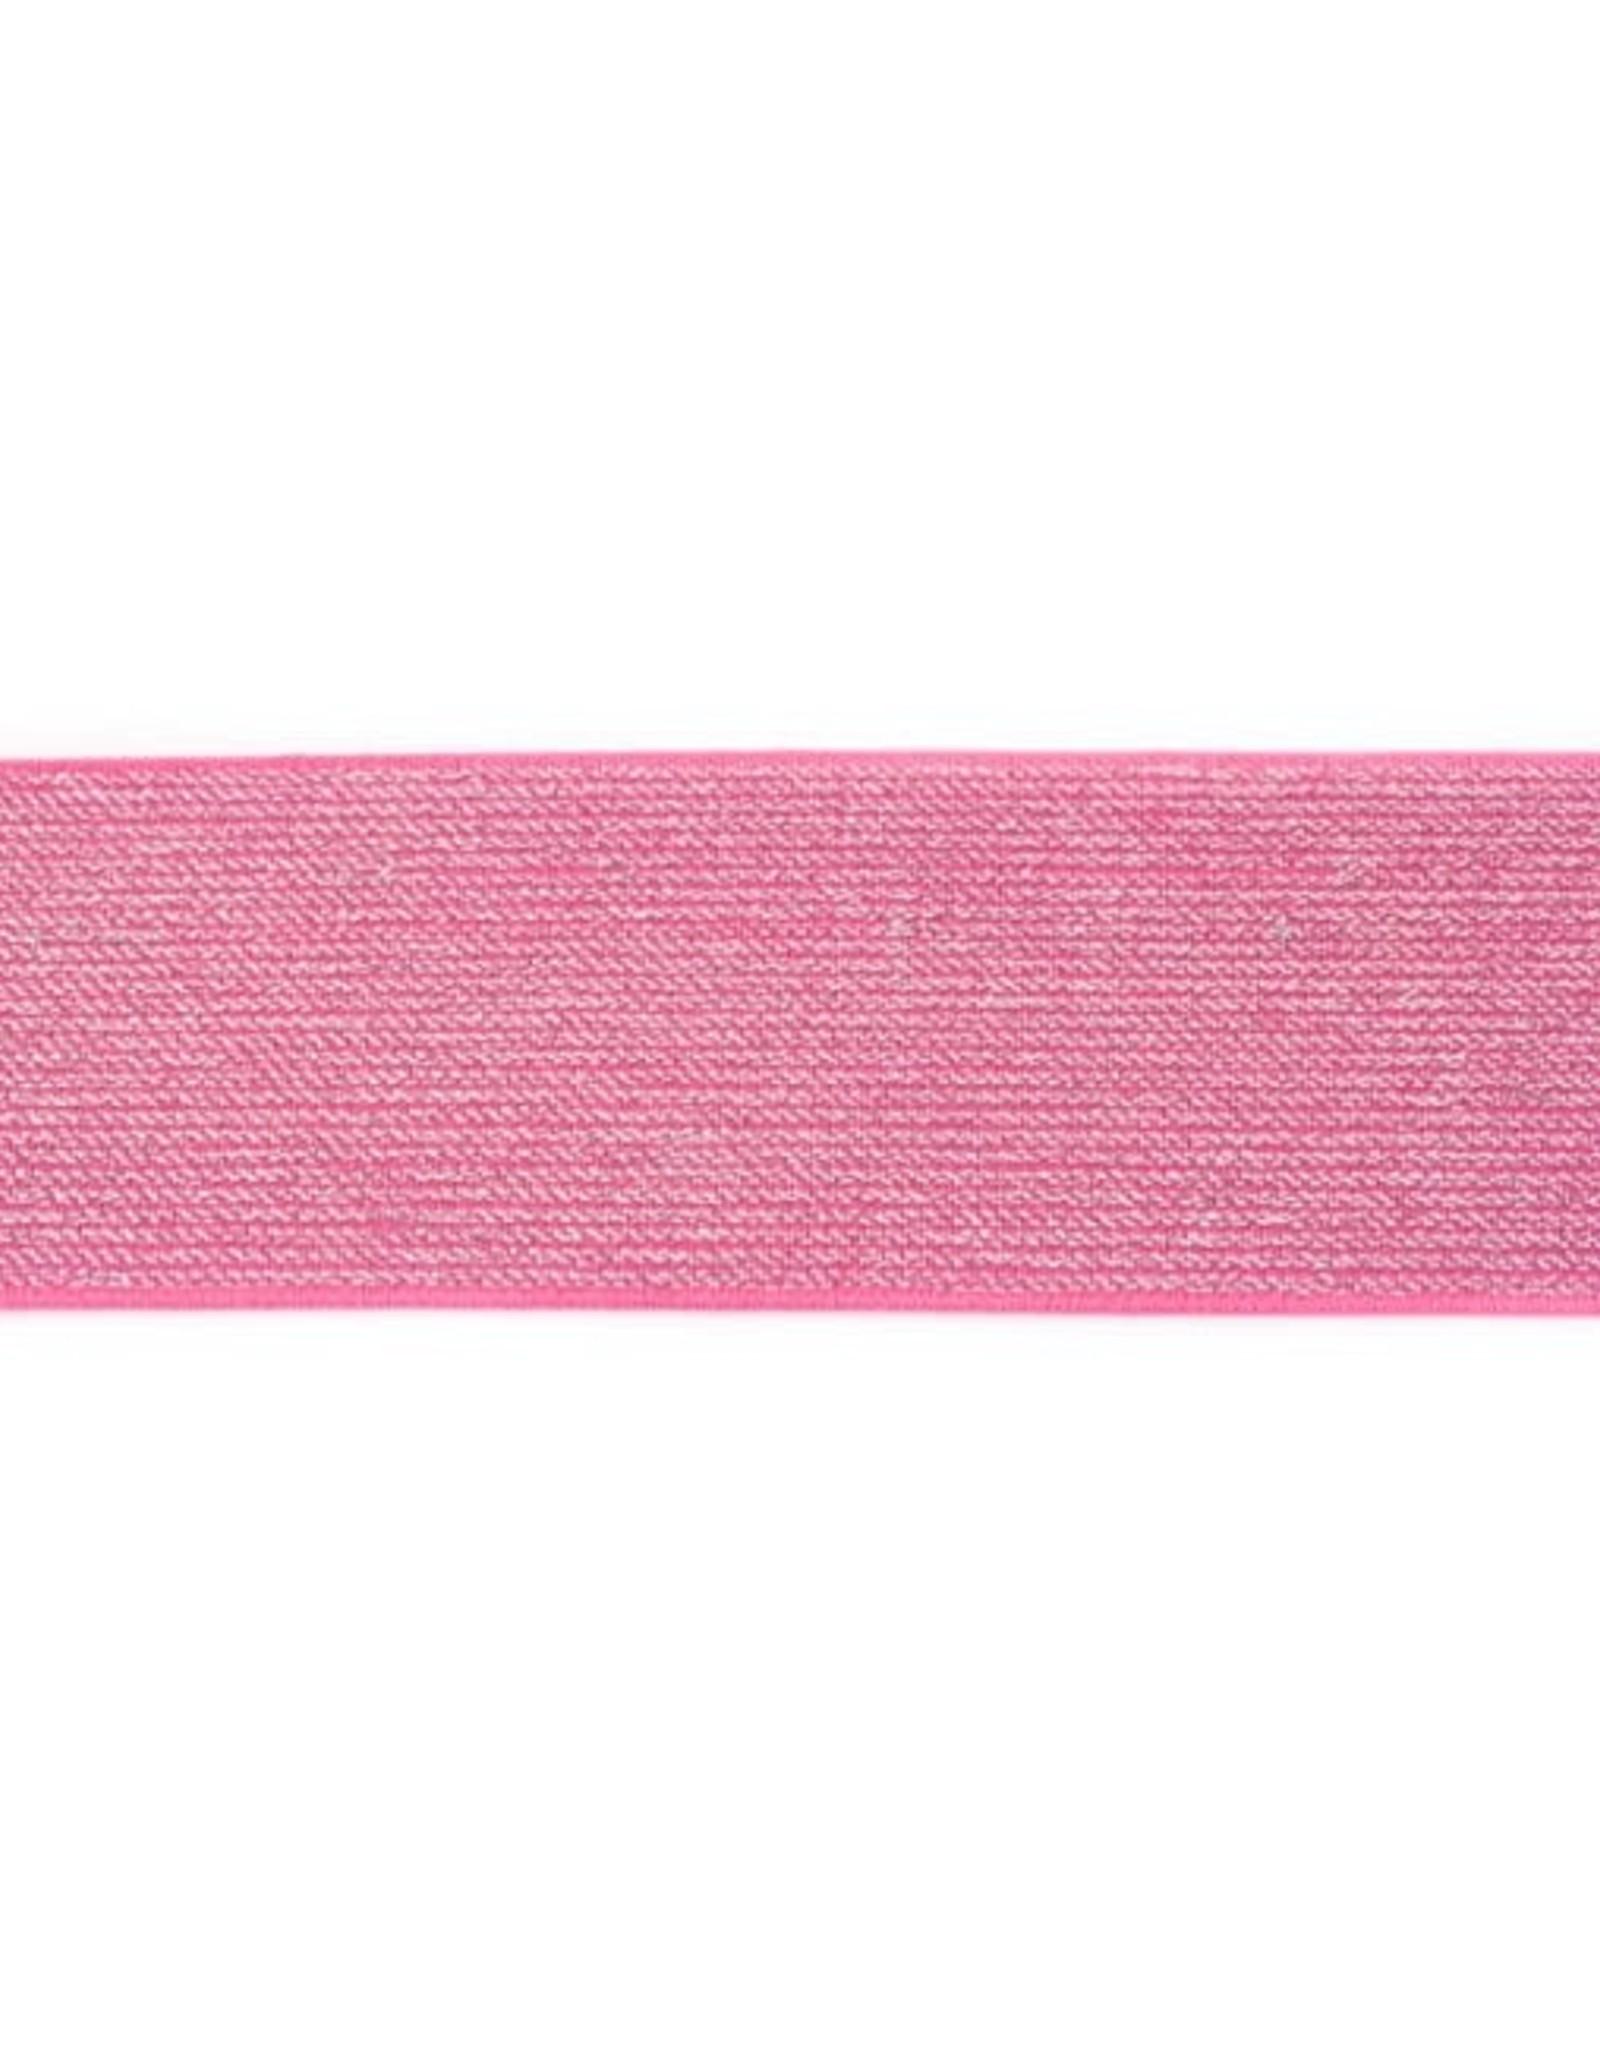 Glitterelastiek 50mm - Fuchsia